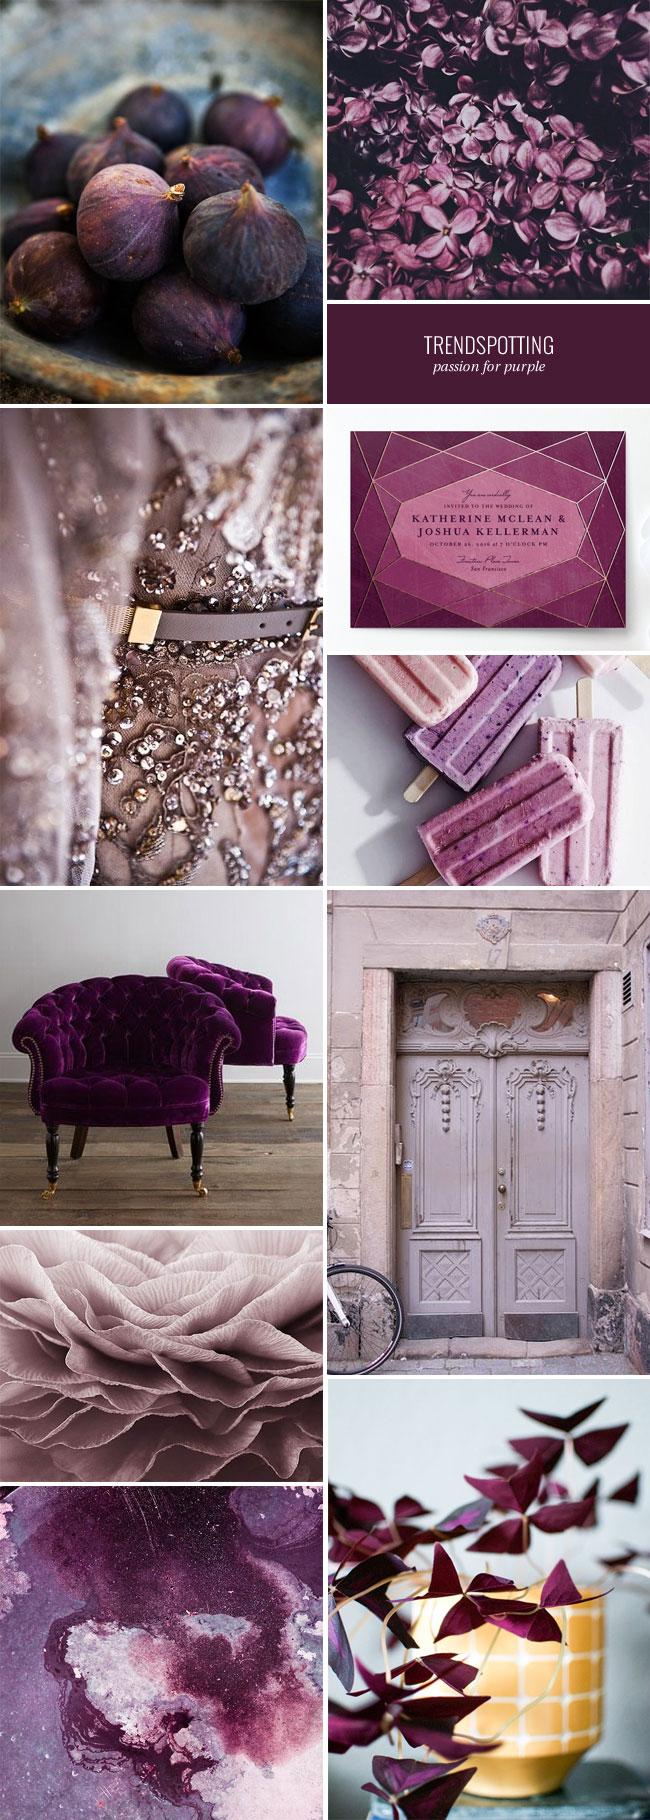 http://i0.wp.com/papercrave.com/wp-content/uploads/2015/11/trendspotting-passion-for-purple.jpg?resize=650%2C1820